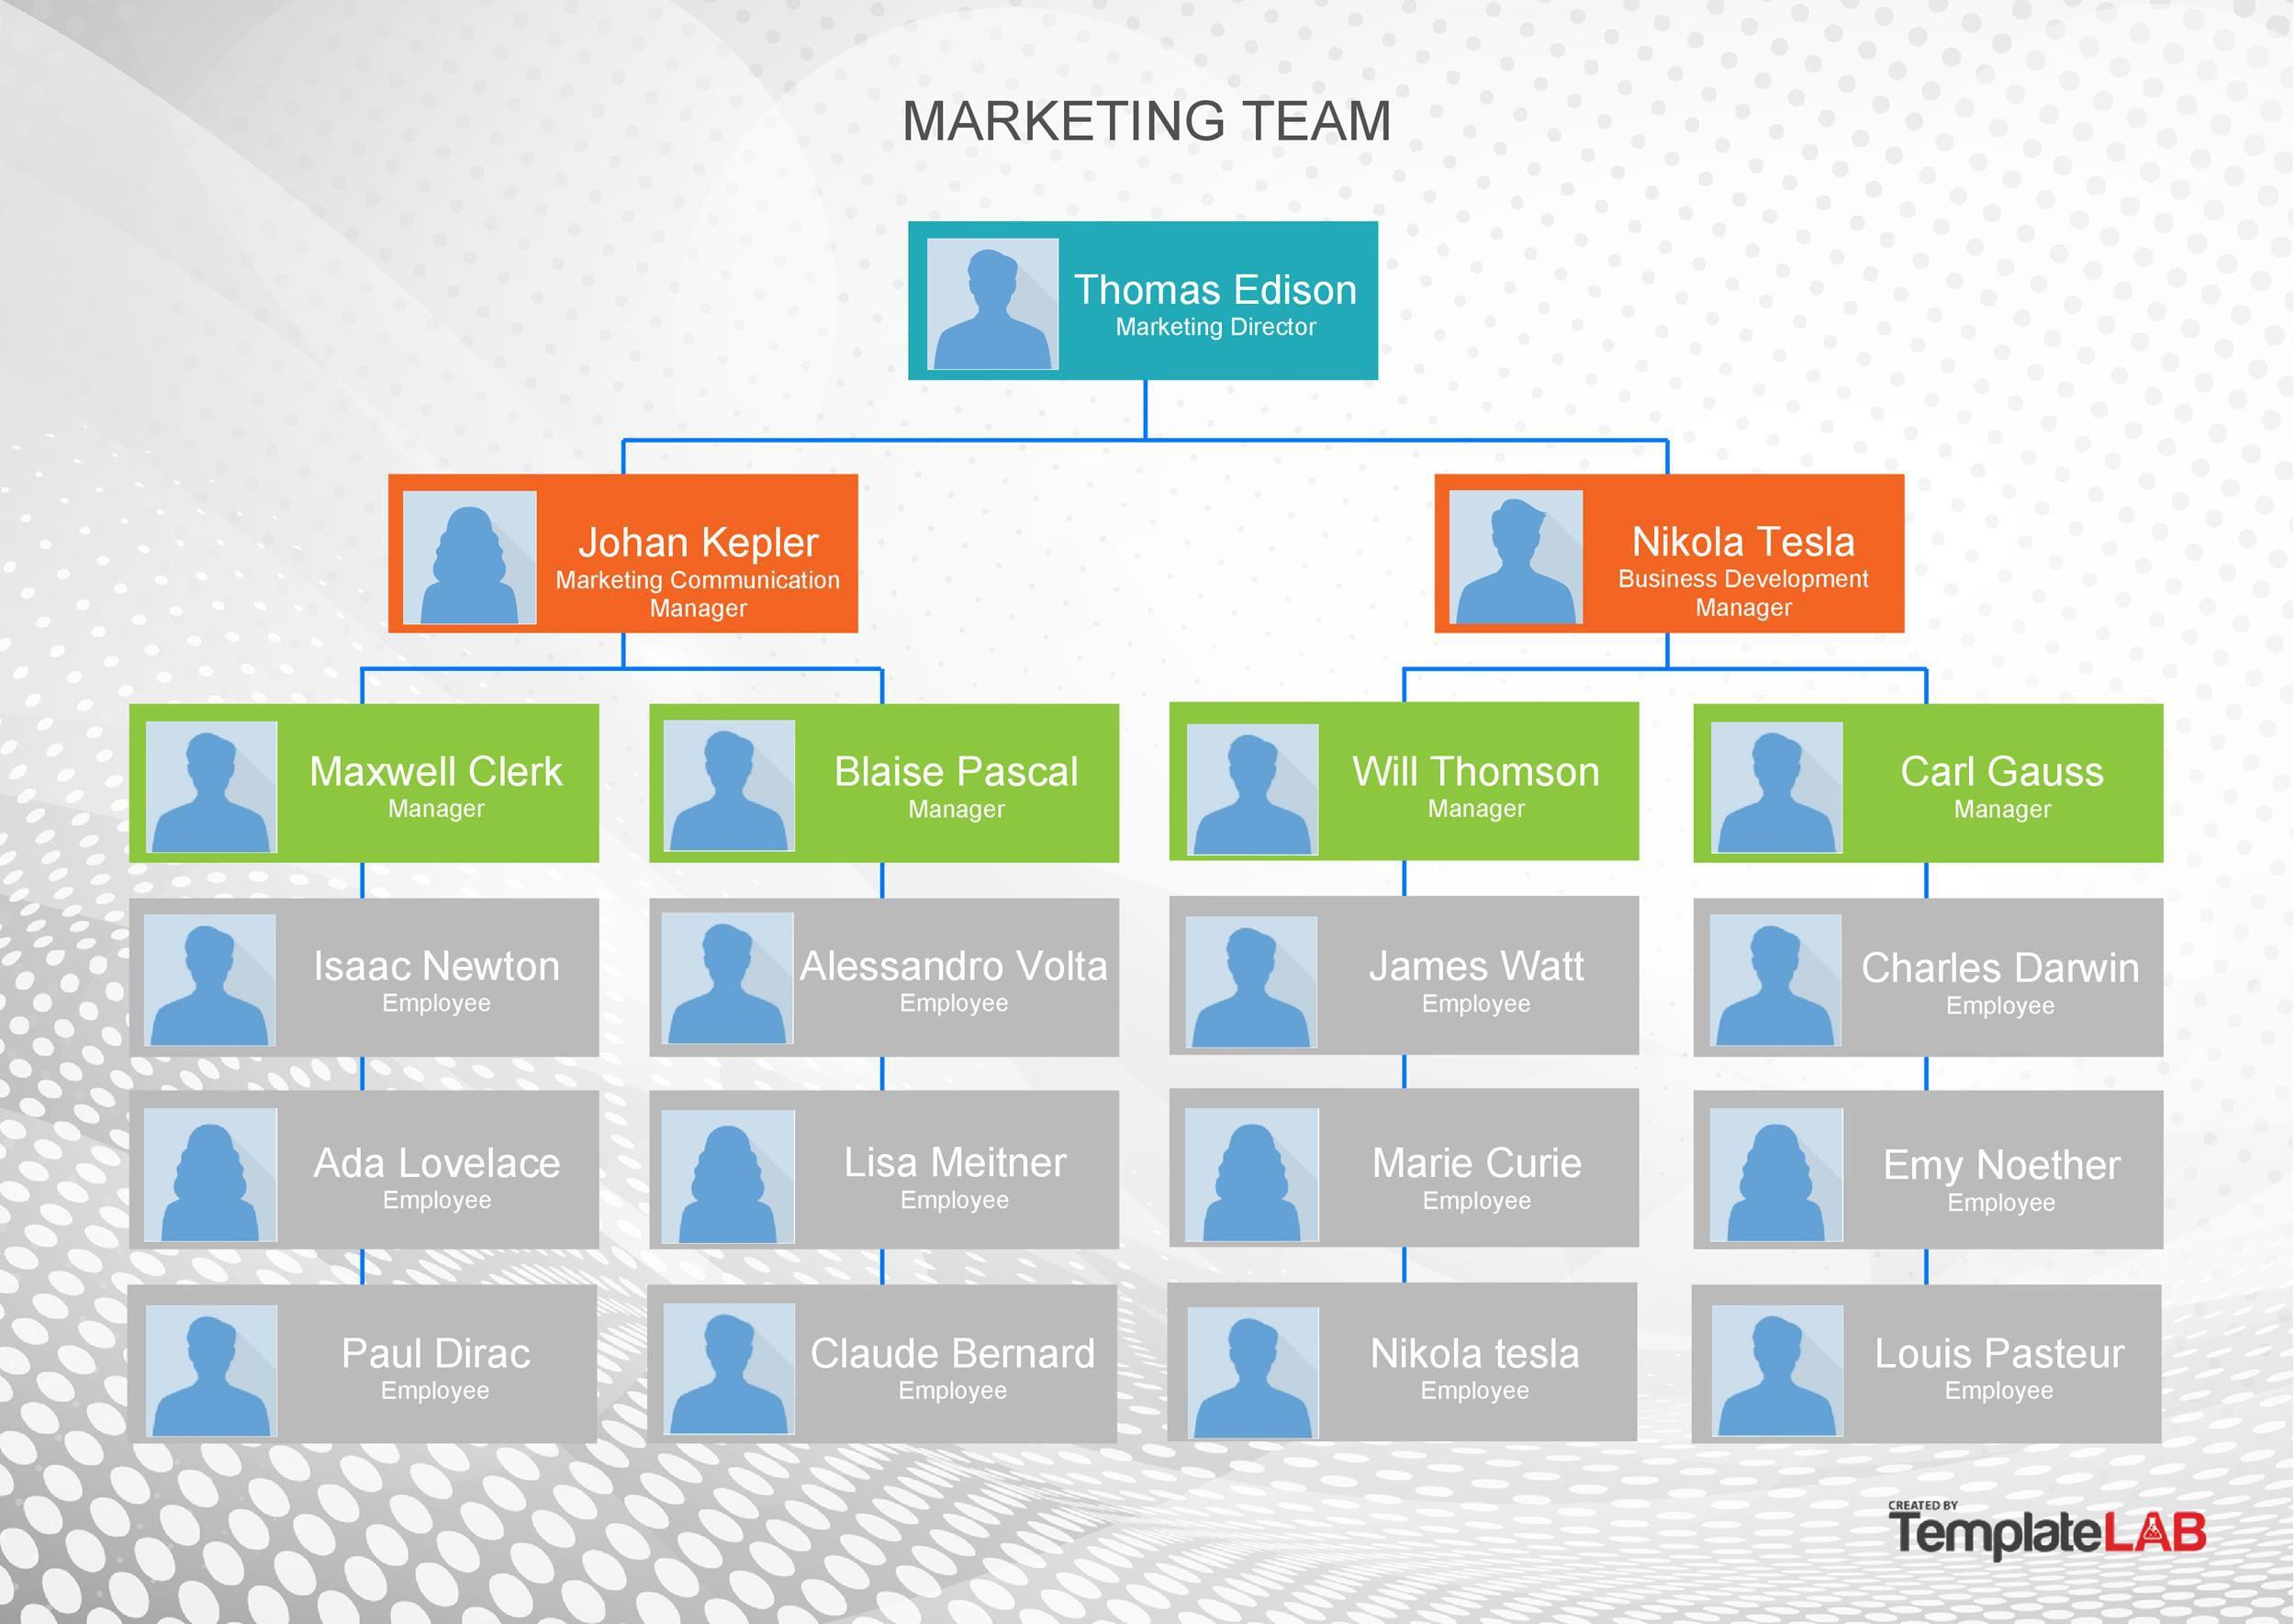 003 Breathtaking Microsoft Organisation Chart Template Highest Clarity  Visio Organization Excel OfficeFull